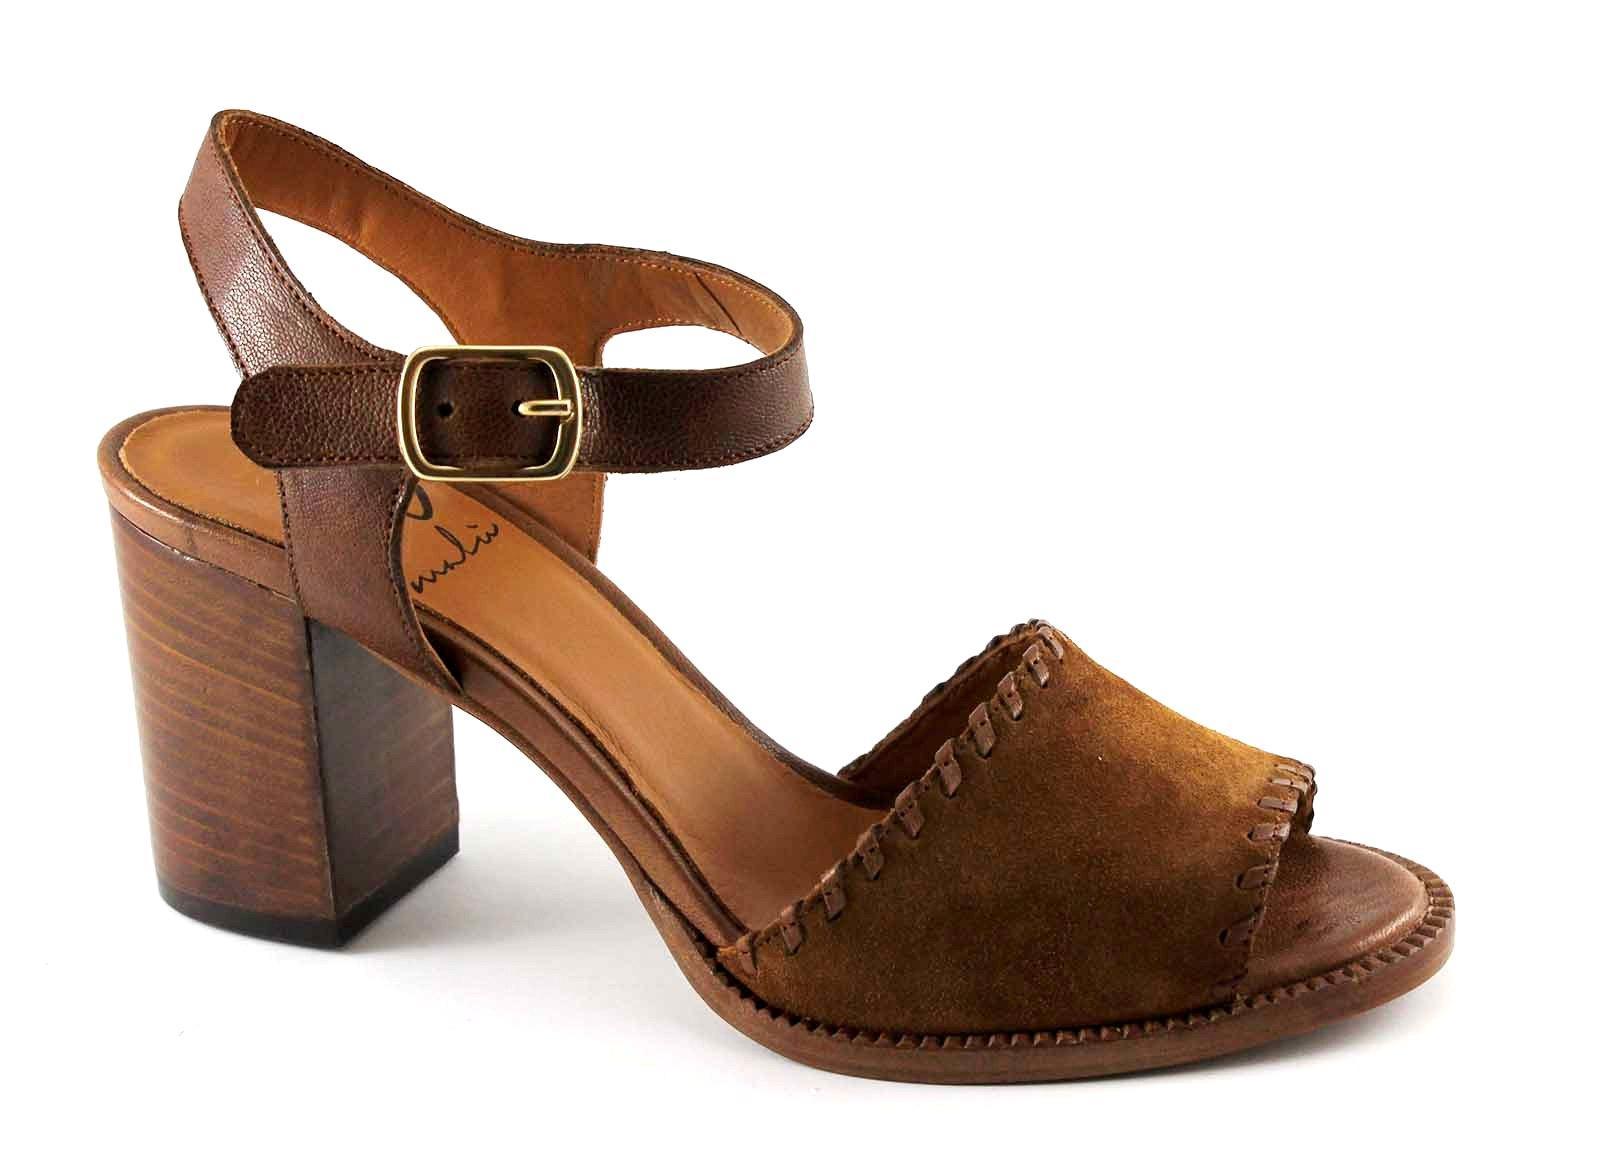 MALU' 9093 tabacco tabacco 9093 marrone scarpe scarpe scarpe sandali donna   3d2504